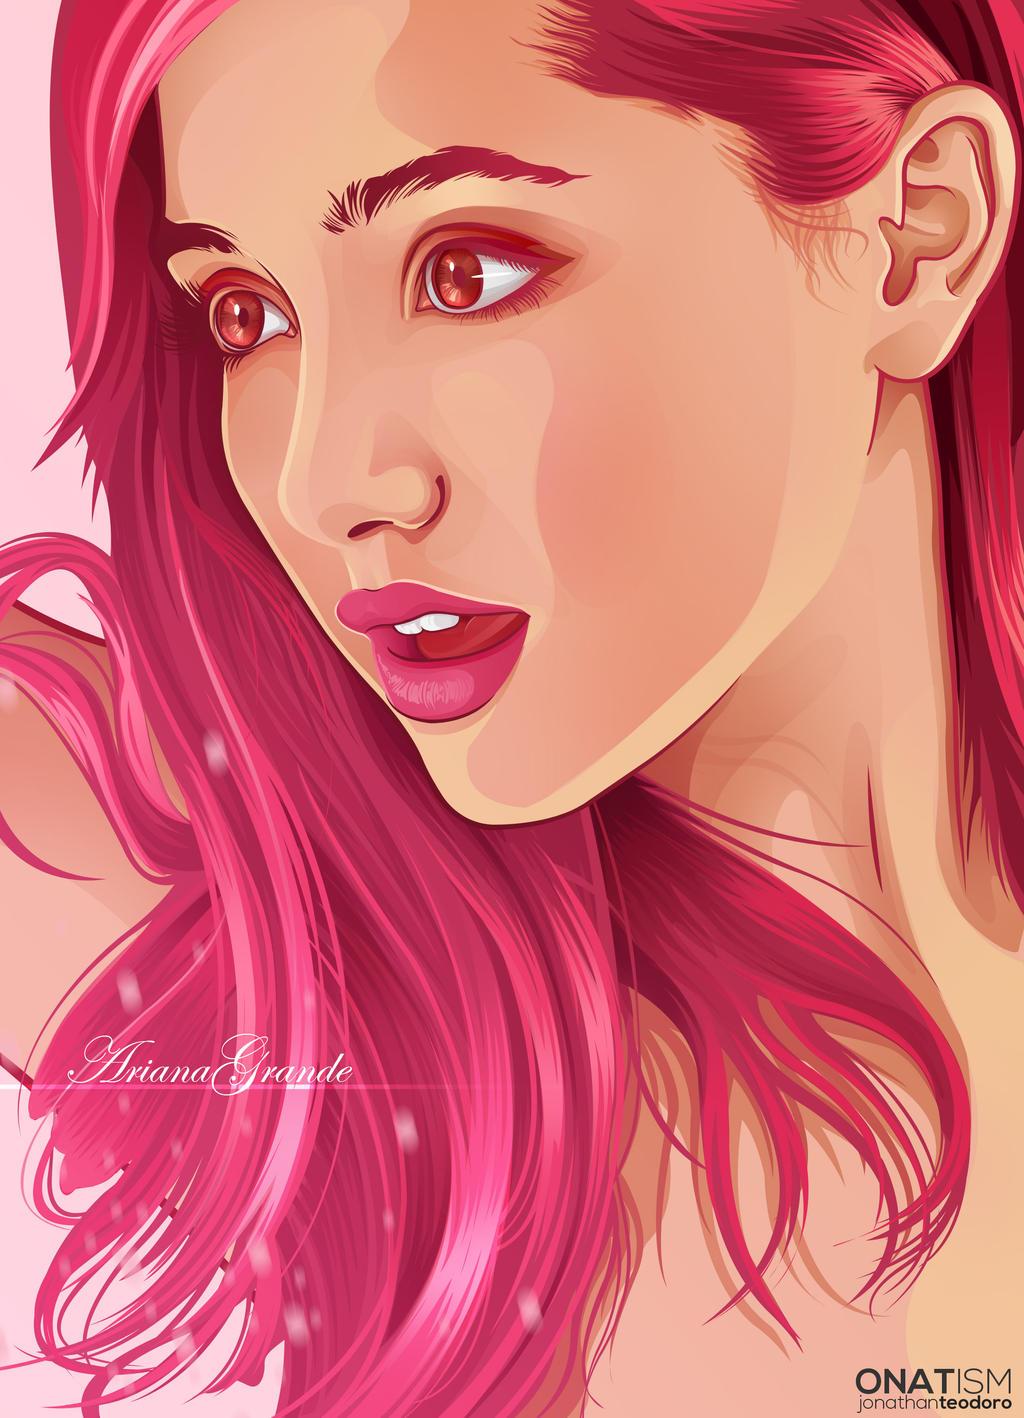 Ariana Grande by jonathan36